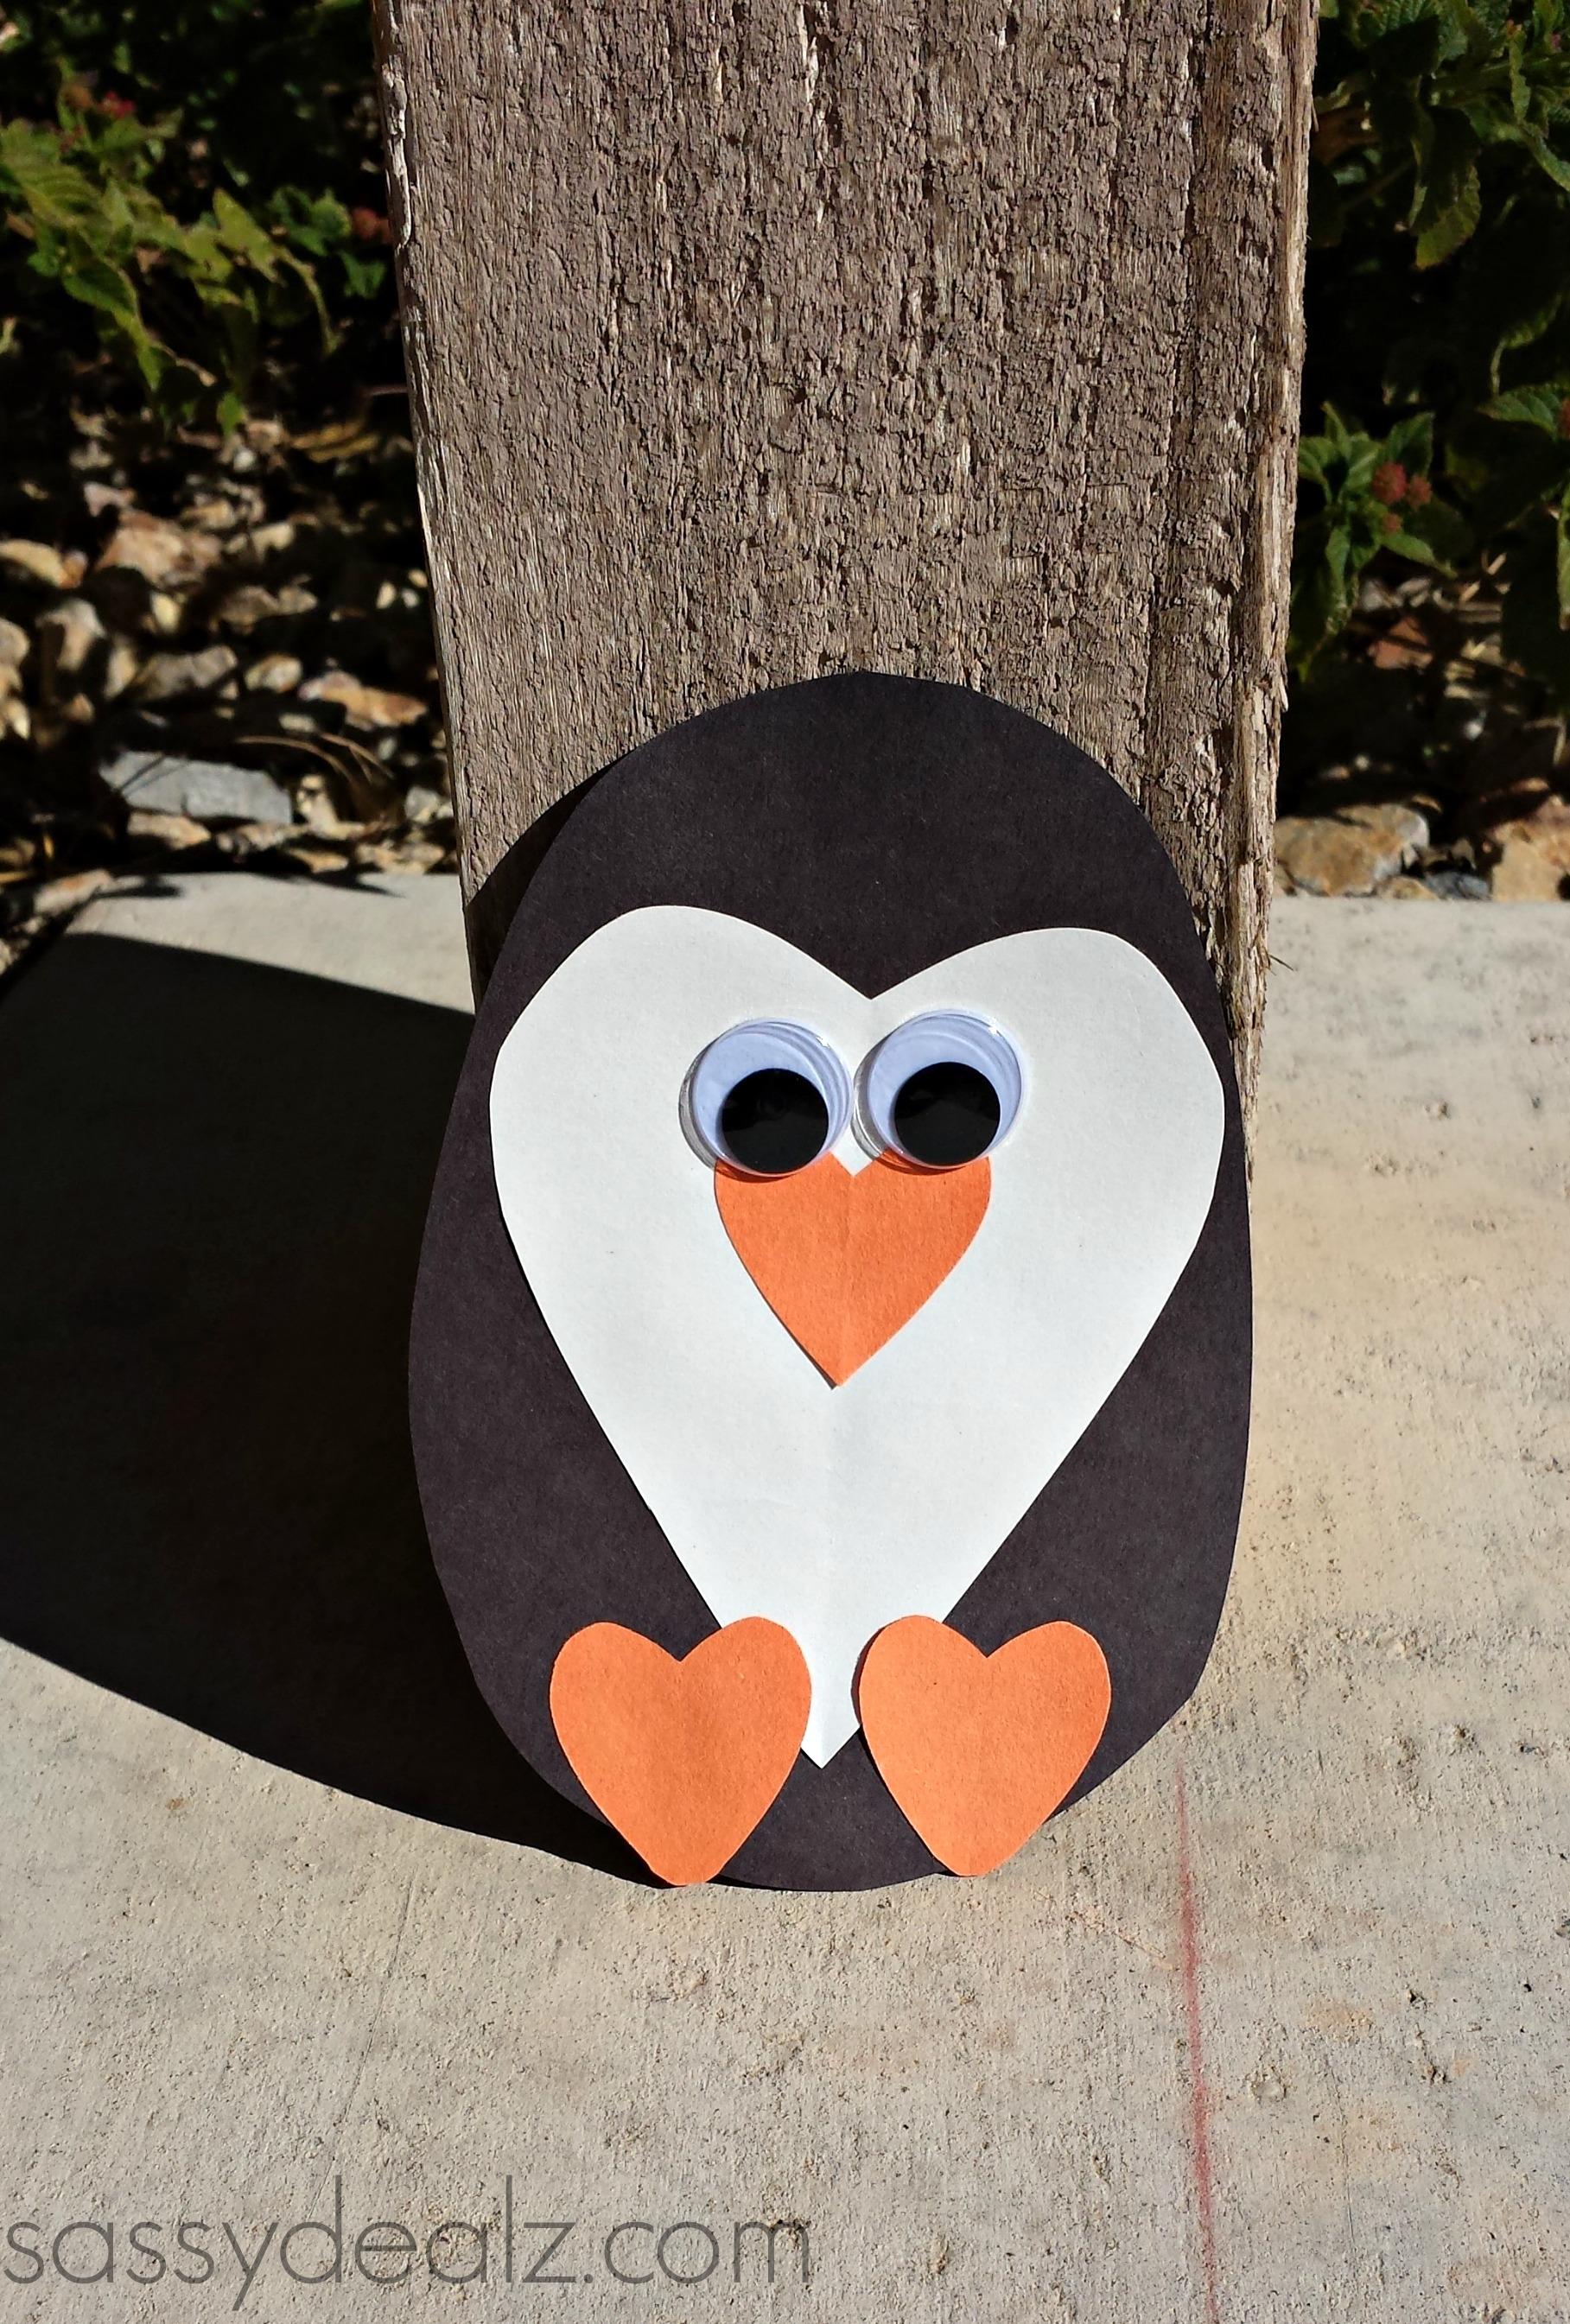 Paper heart penguin craft for kids crafty morning - Sassydeals com ...